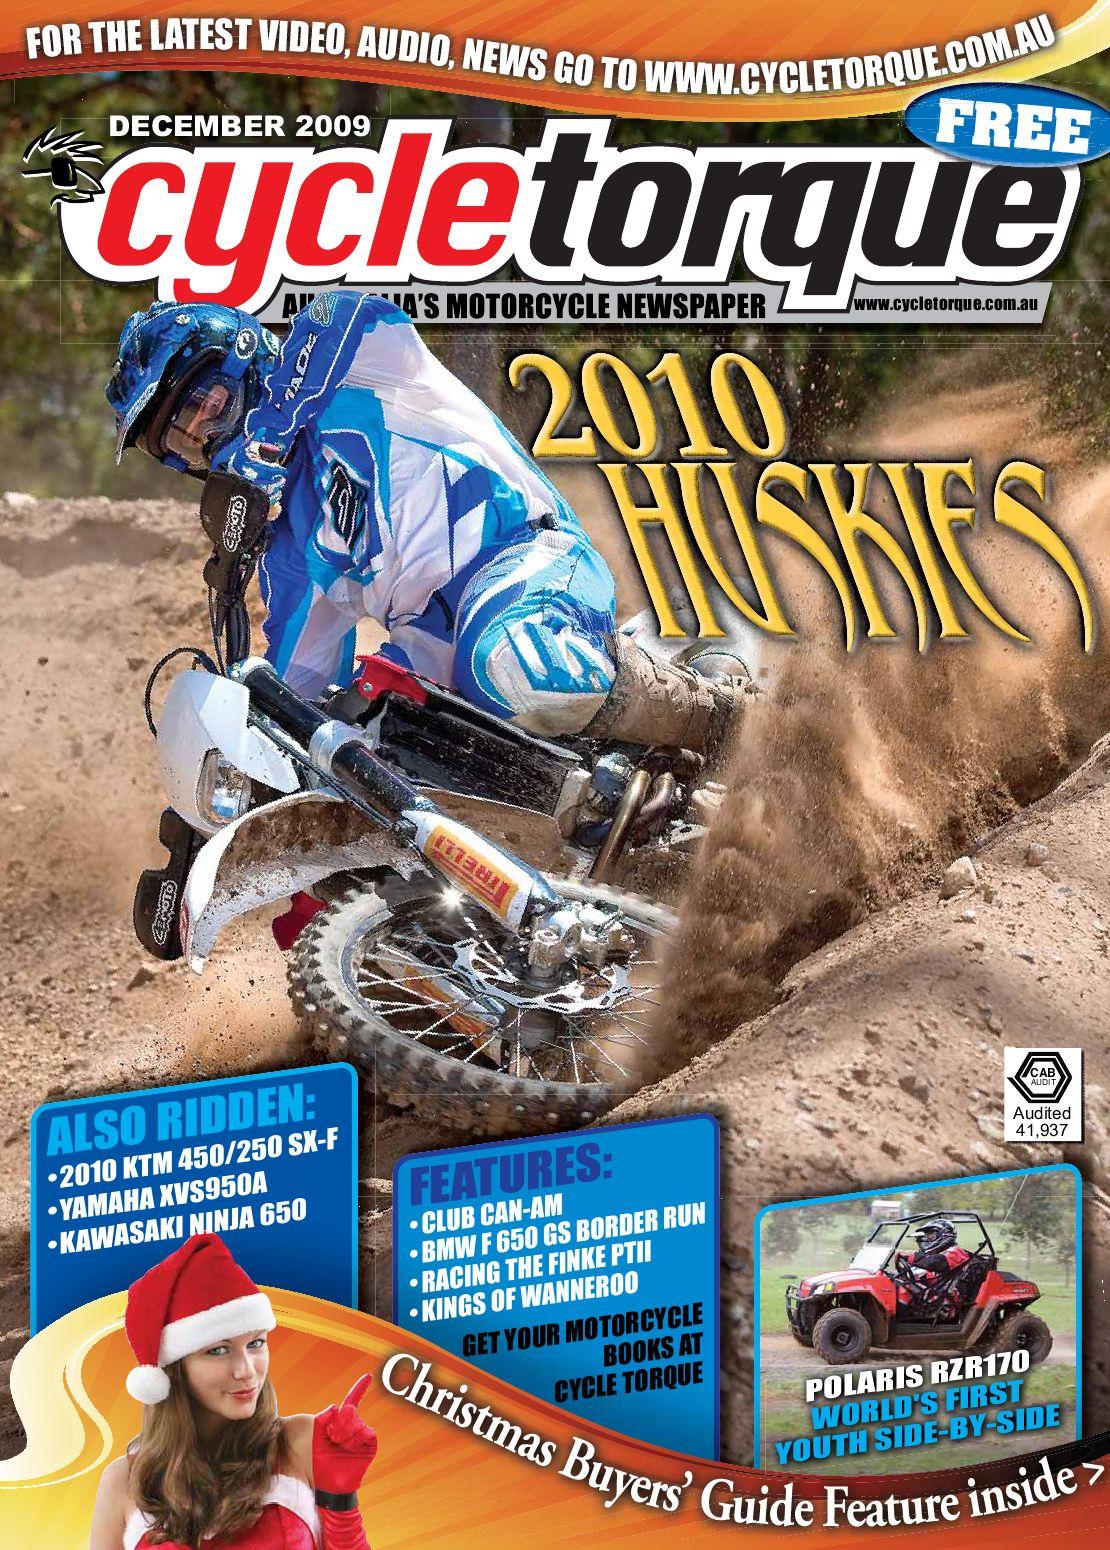 Motocross Racing Dirt Bike Motorcycle Lift Stand For Kawasaki KLX 110 125 140 250 300 450 650